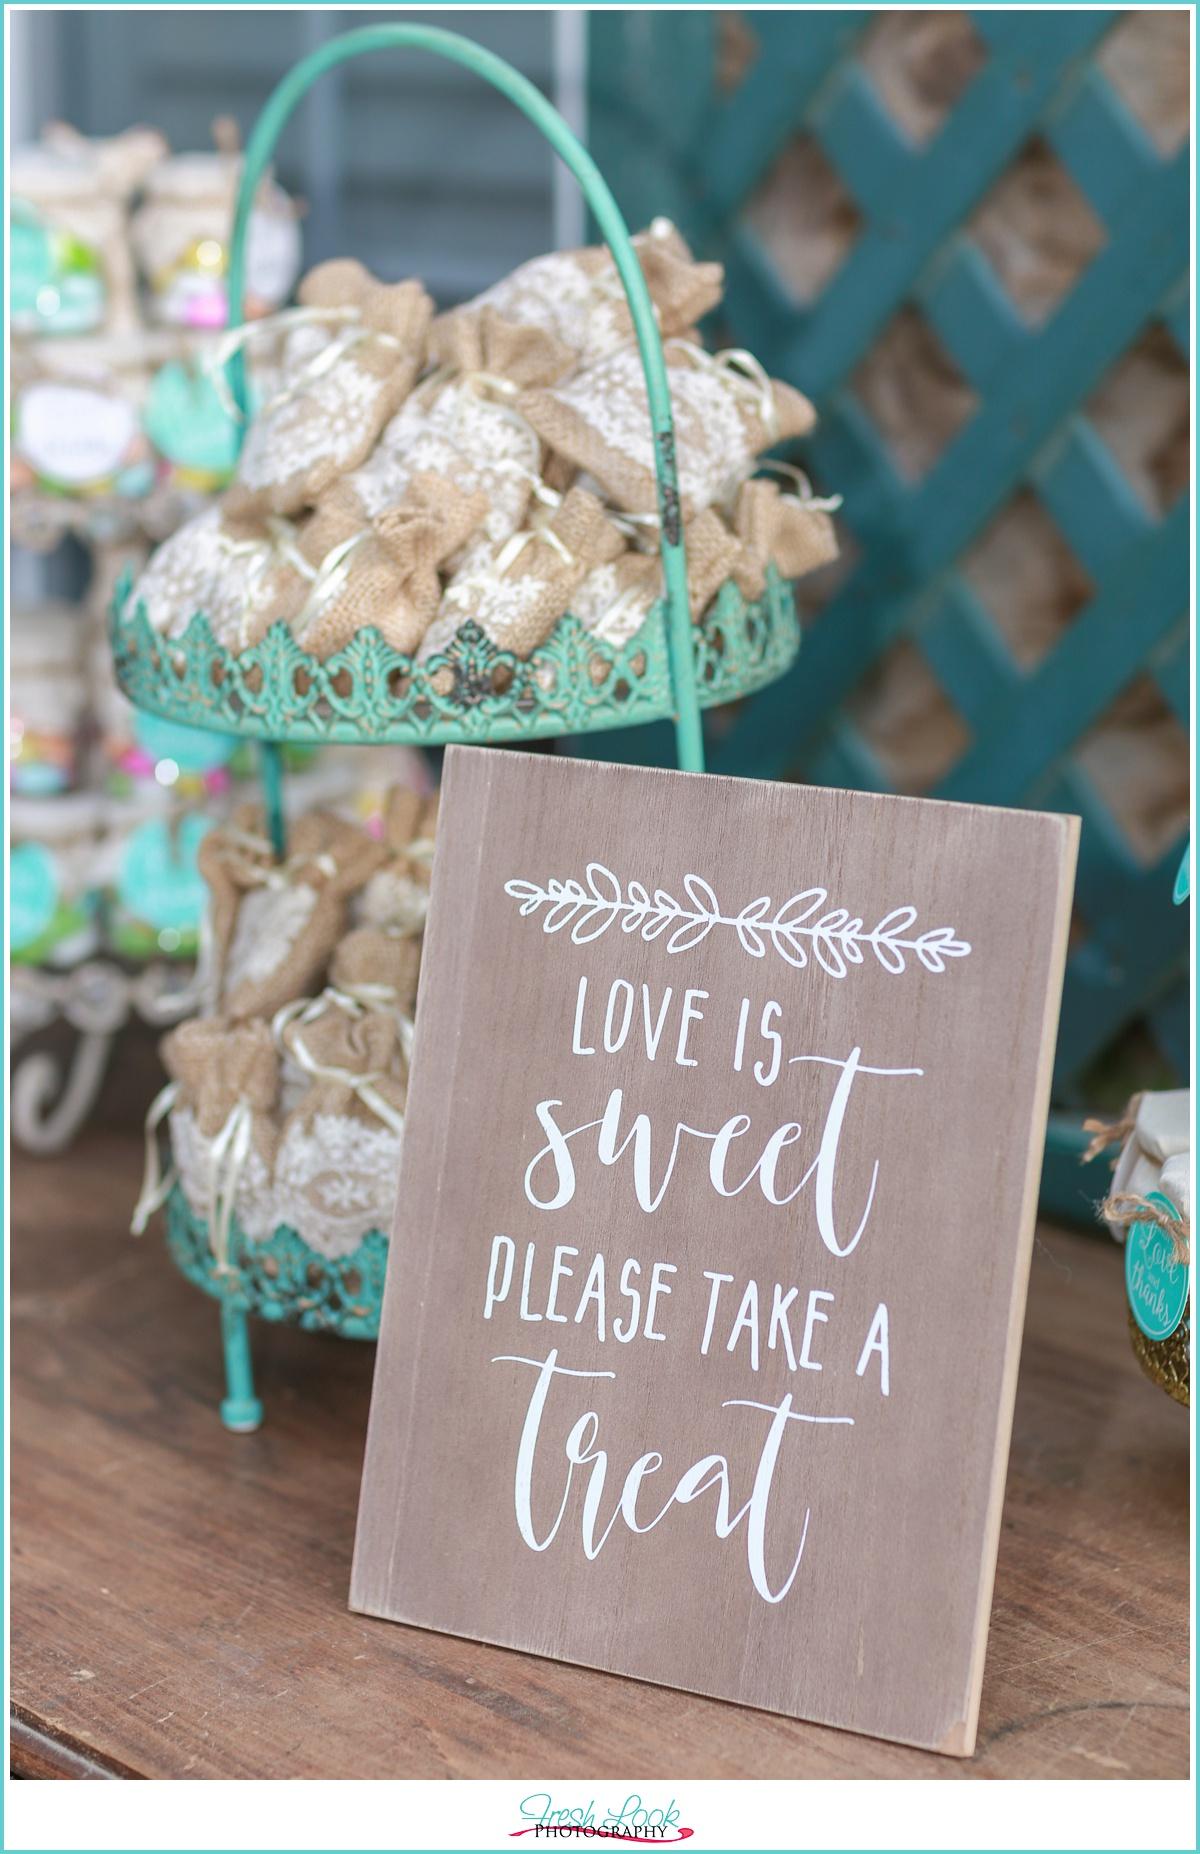 wedding favor treat sign